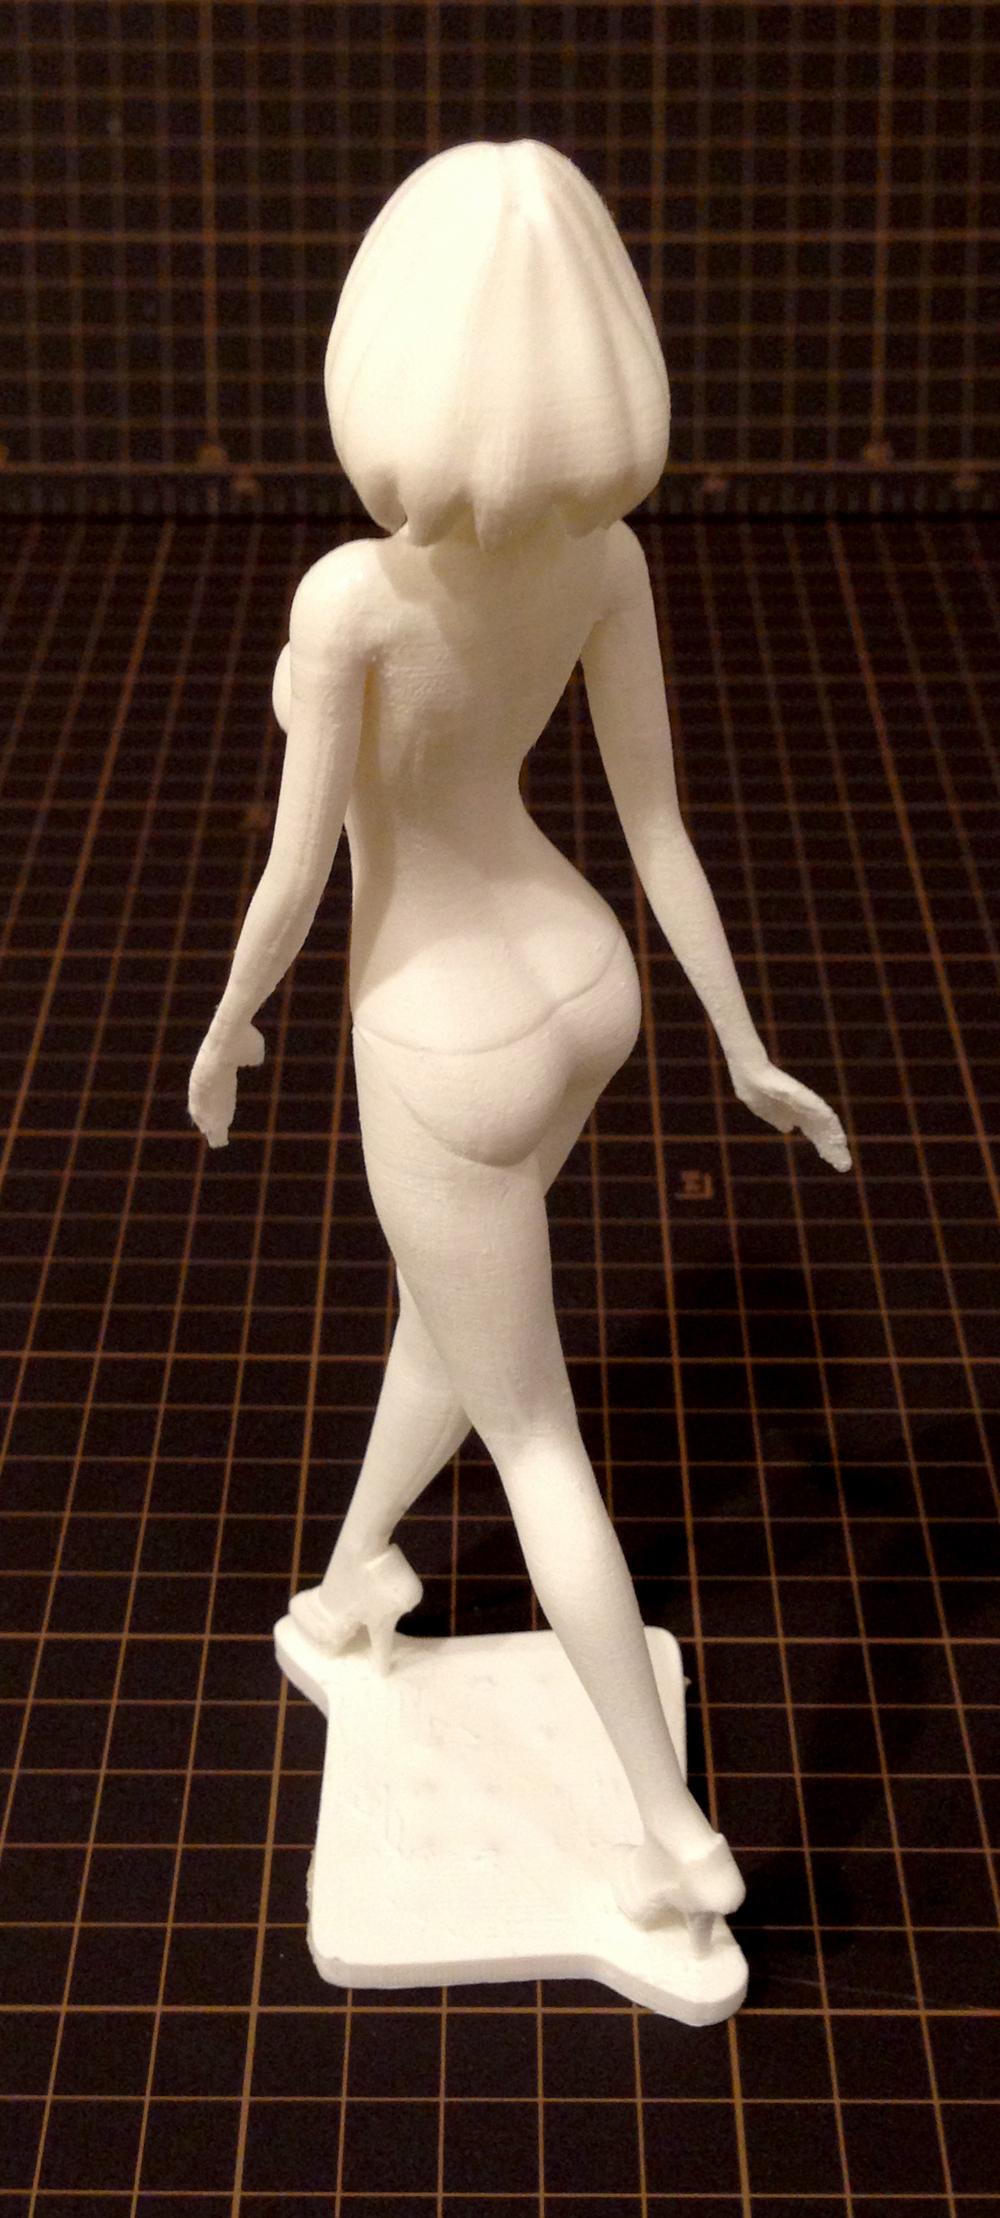 3Dフィギュア「hanako」の奇麗な3Dプリントの後ろ姿